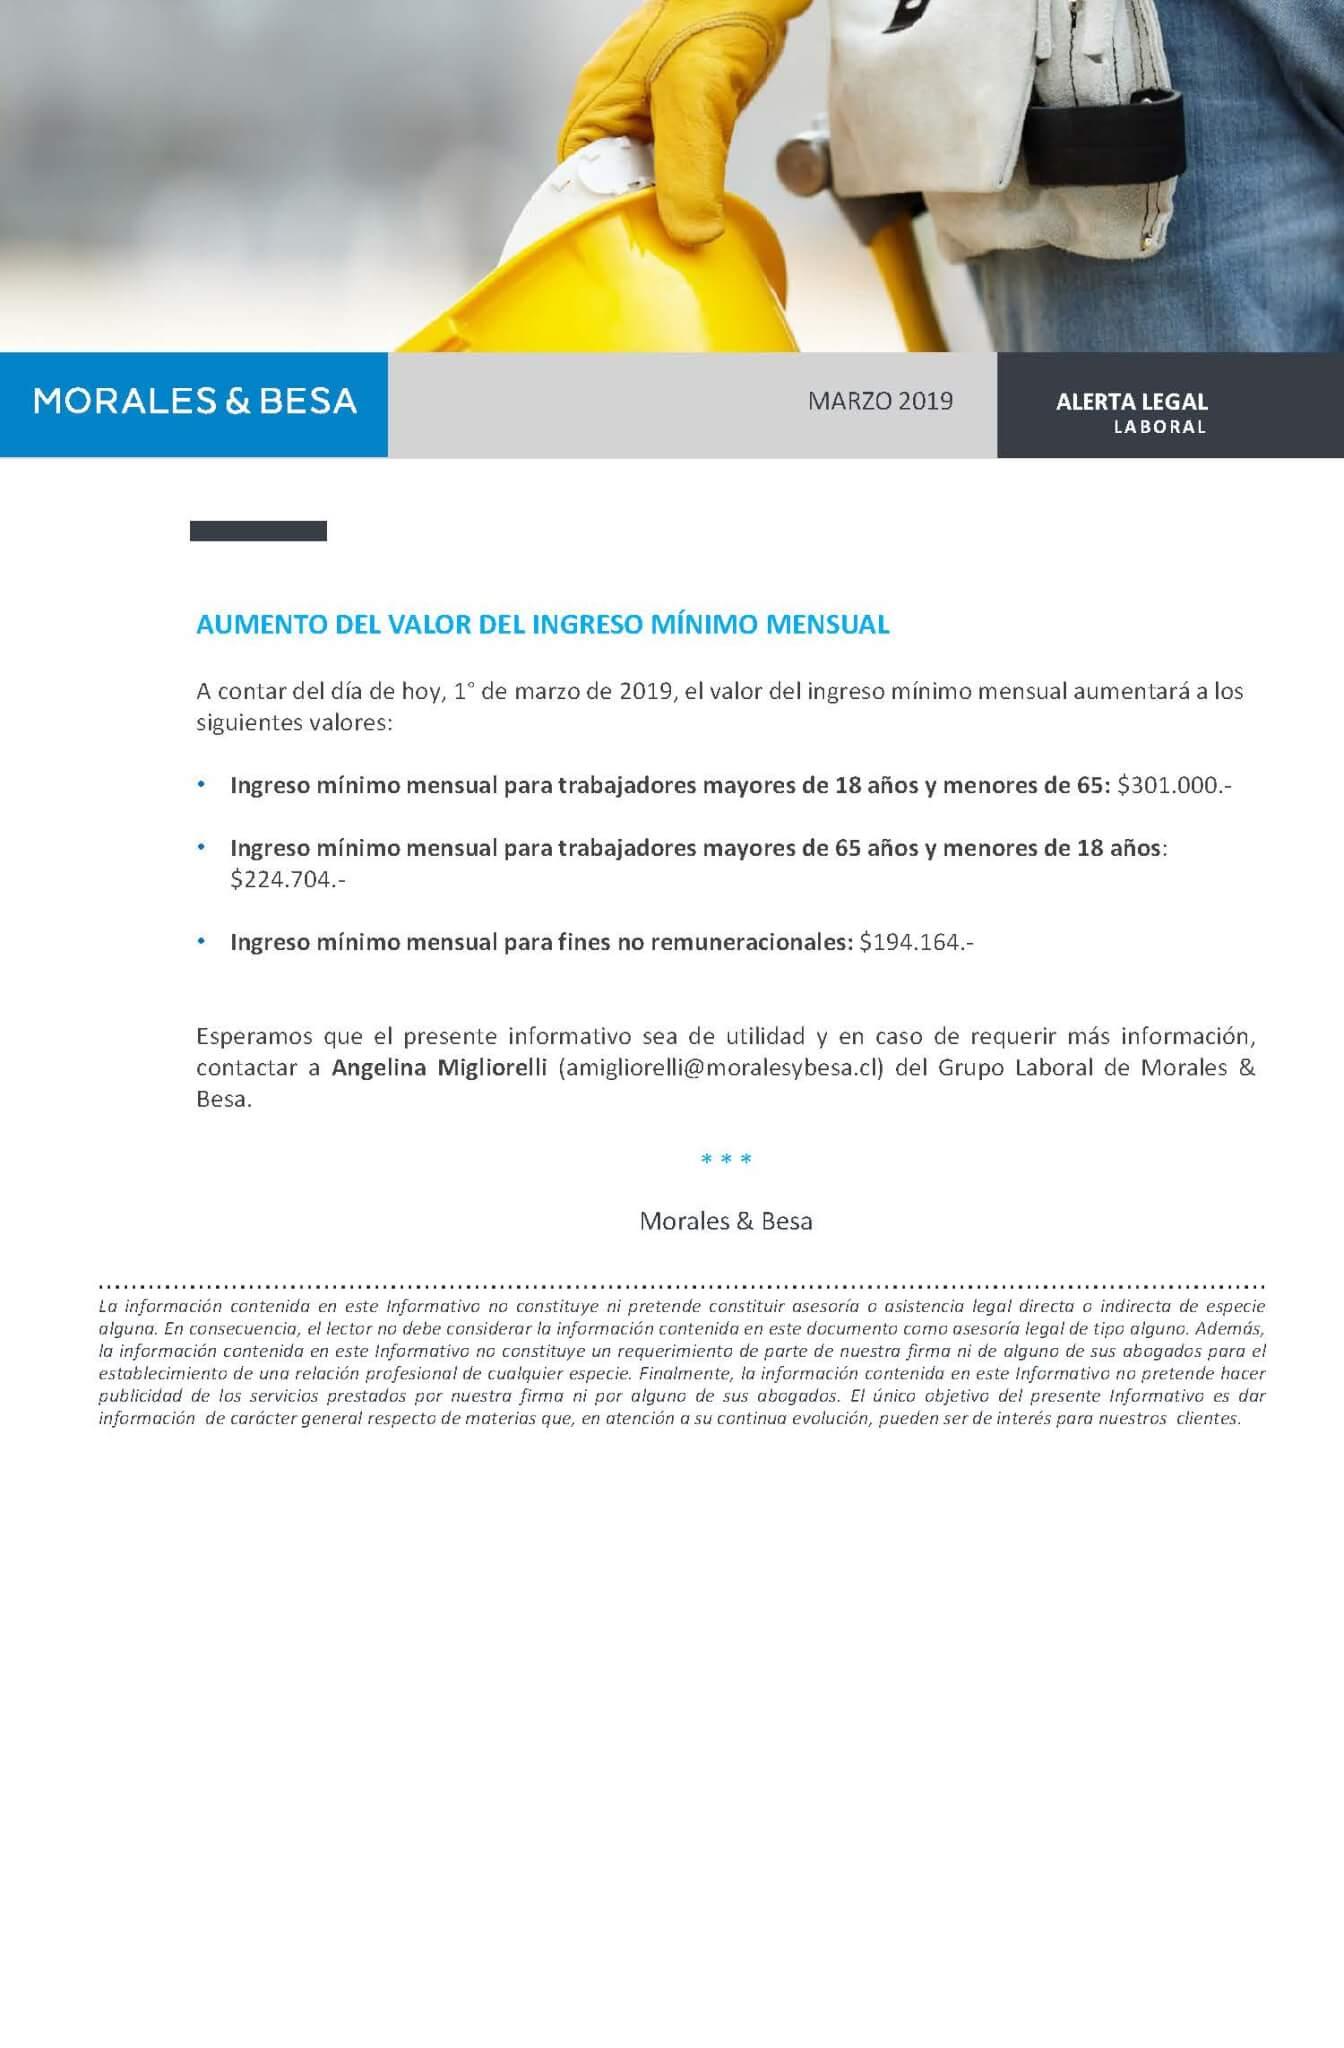 Morales Besa_ Alerta Legal_Laboral_marzo 2019